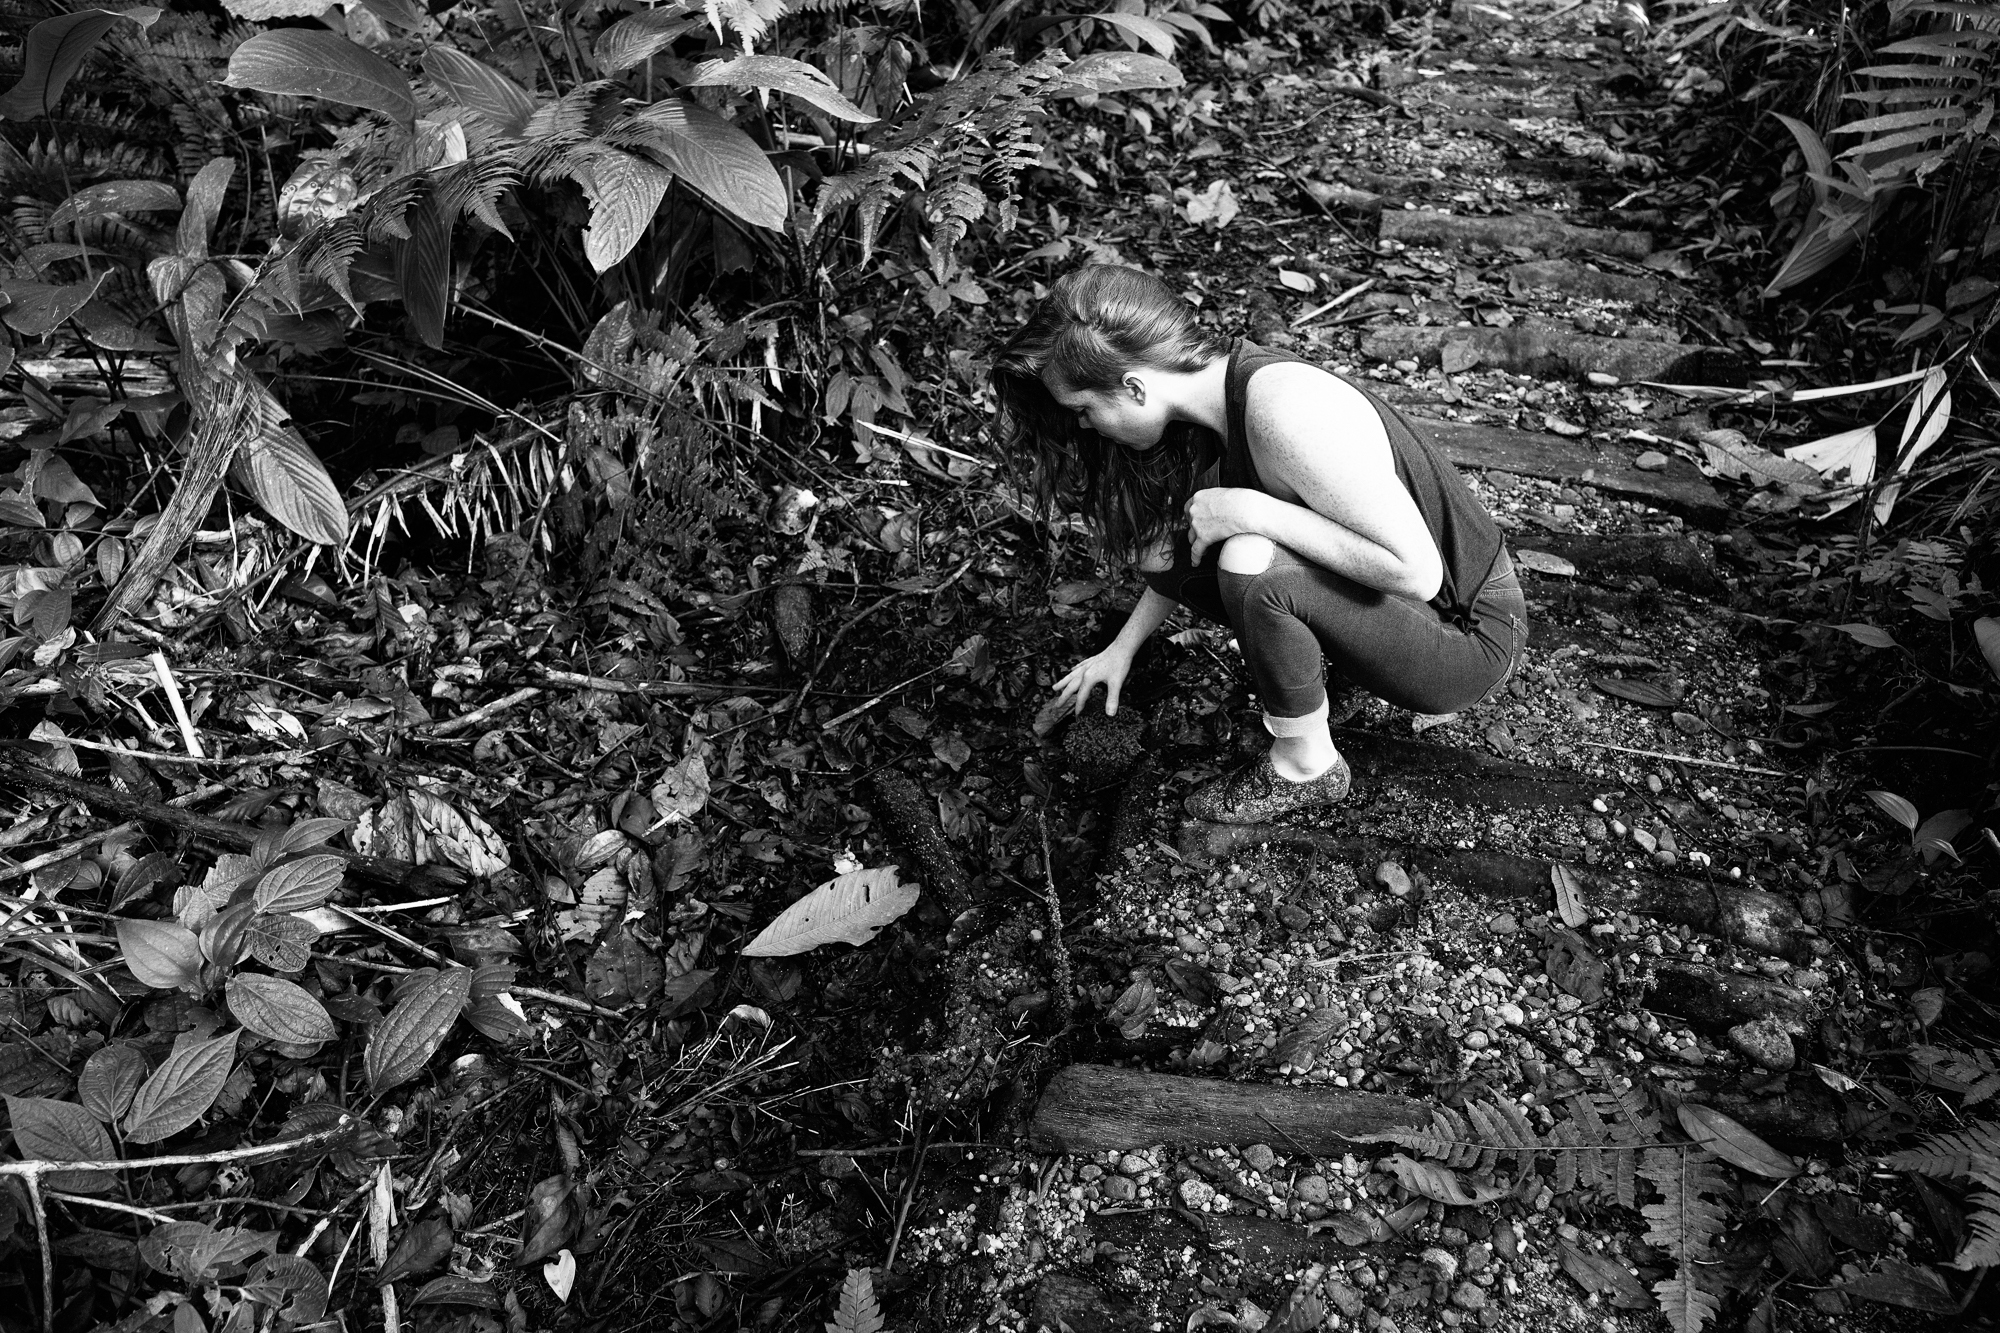 20170210-Ariane-Cassidy-Hannah-Amazon-jungle-FUJIFILM-X-Pro2-0116-Edit.jpg